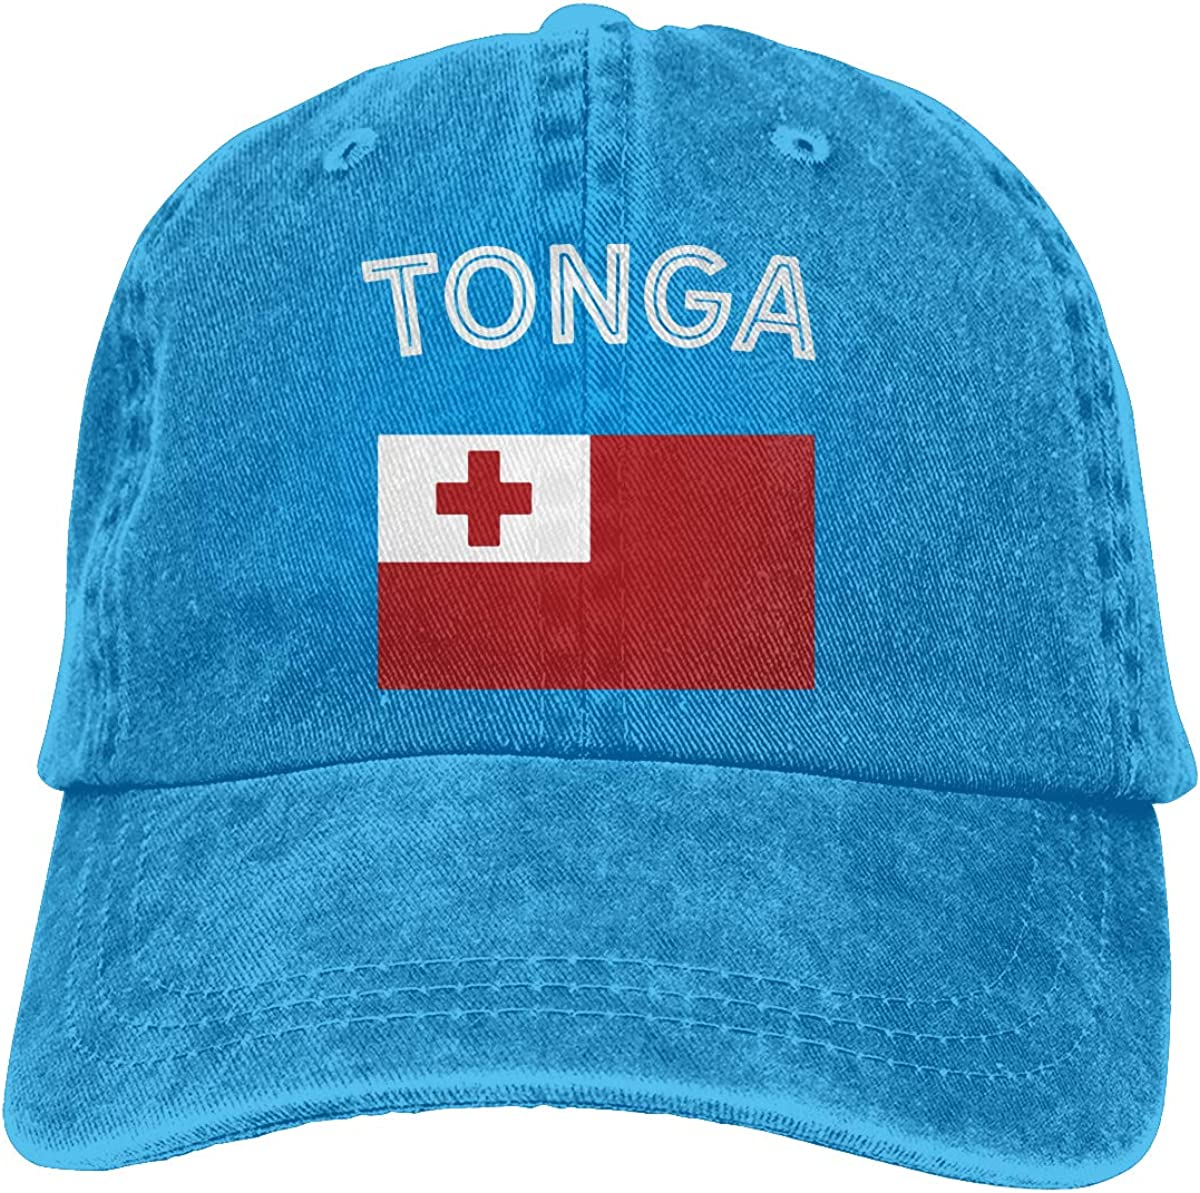 Tonga Flag Unisex Custom Jeans Sun Hat Adjustable Baseball Cap